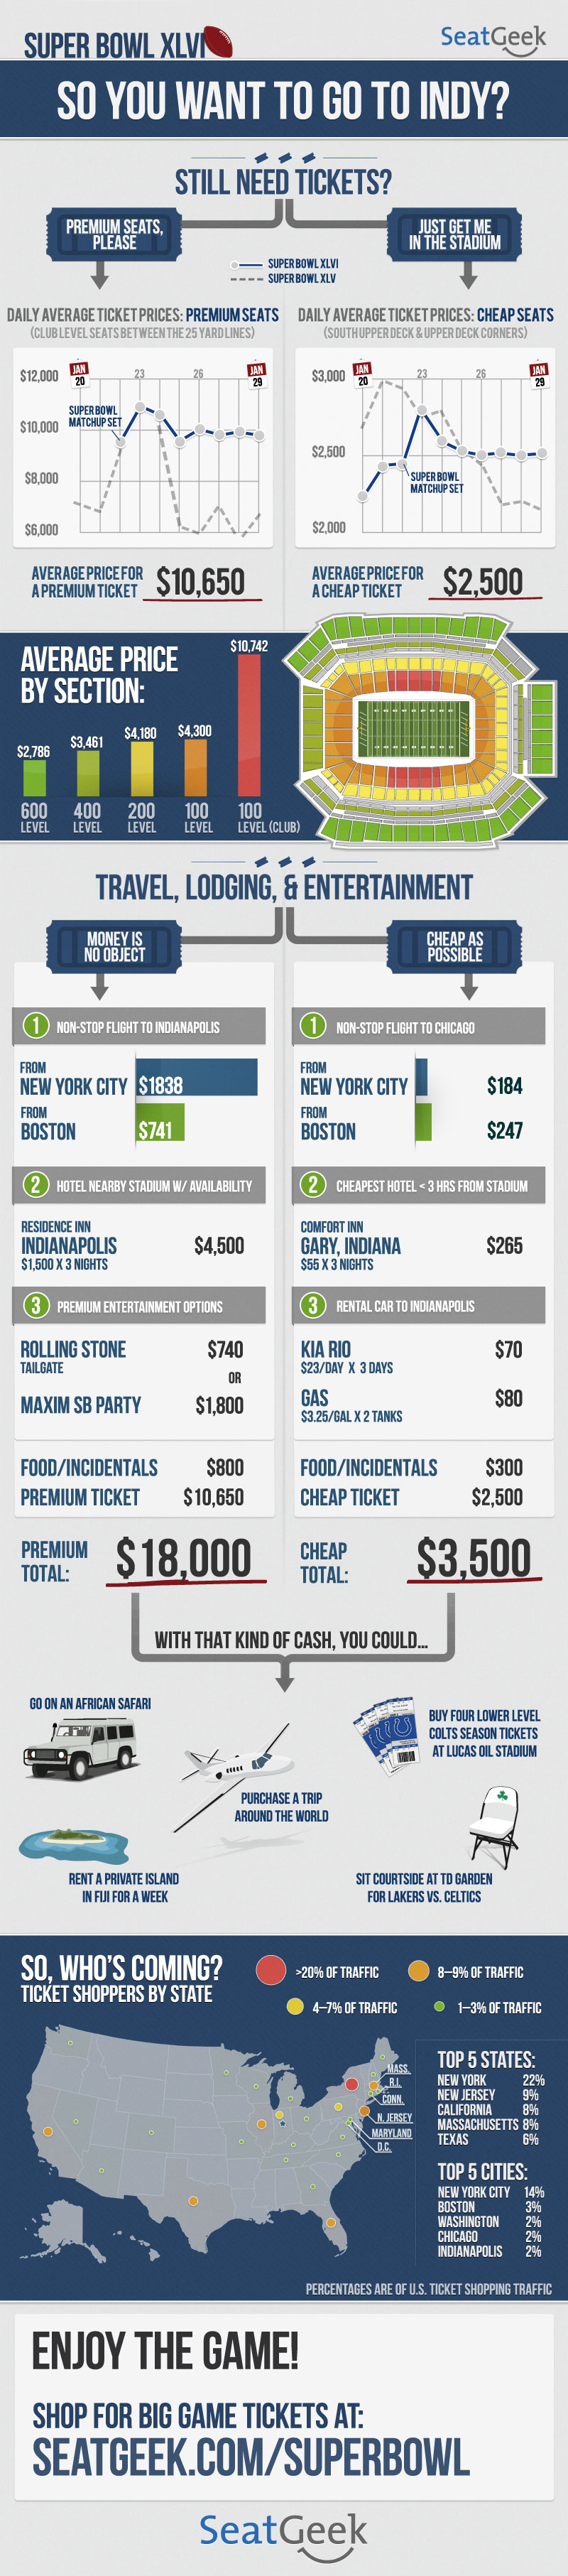 Super Bowl XLVI Infographic